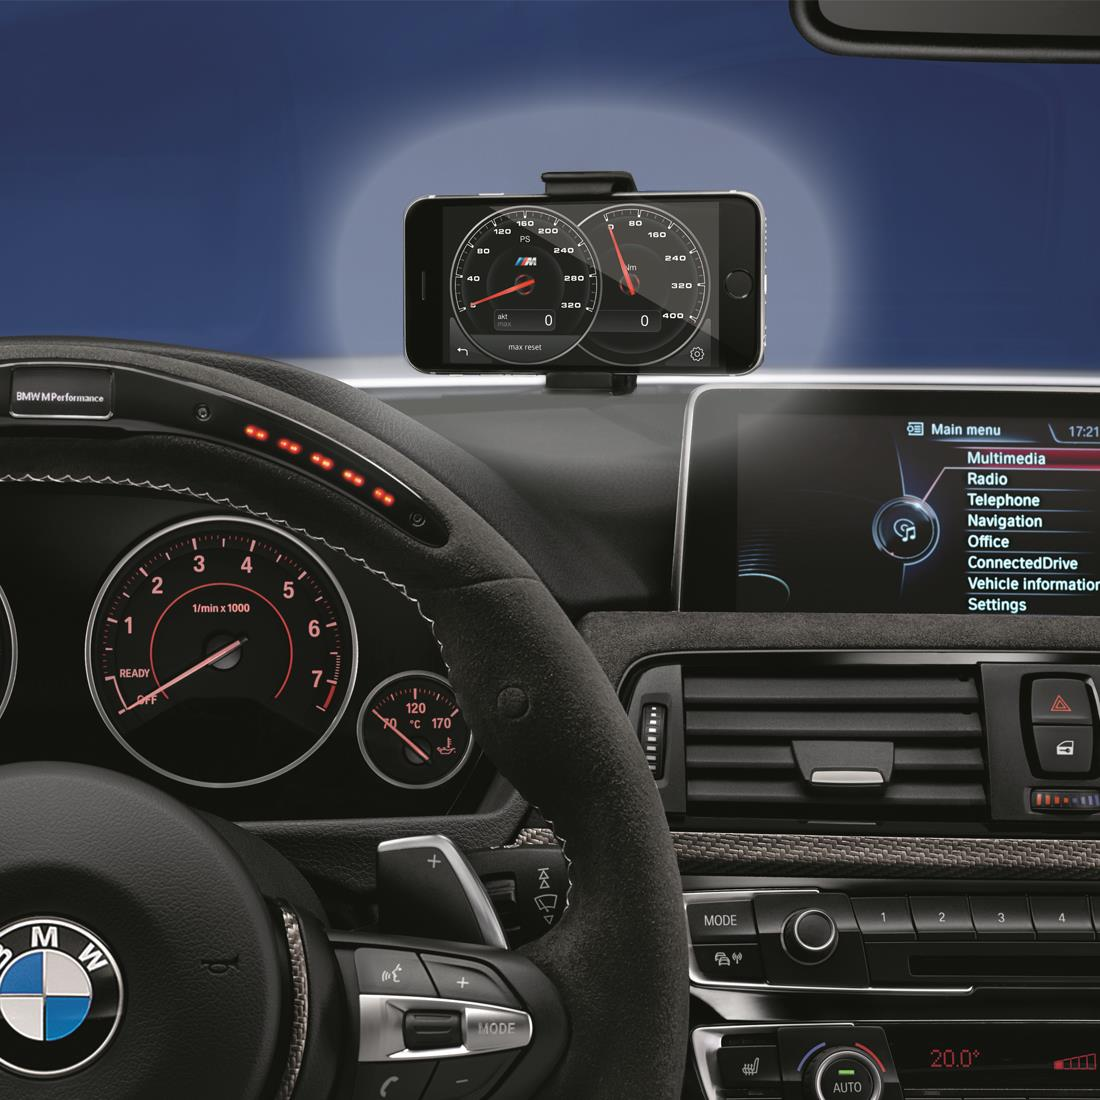 BMW Click & Drive System (fits standard iPhone 4, 5, 6, 7 & 8 models)